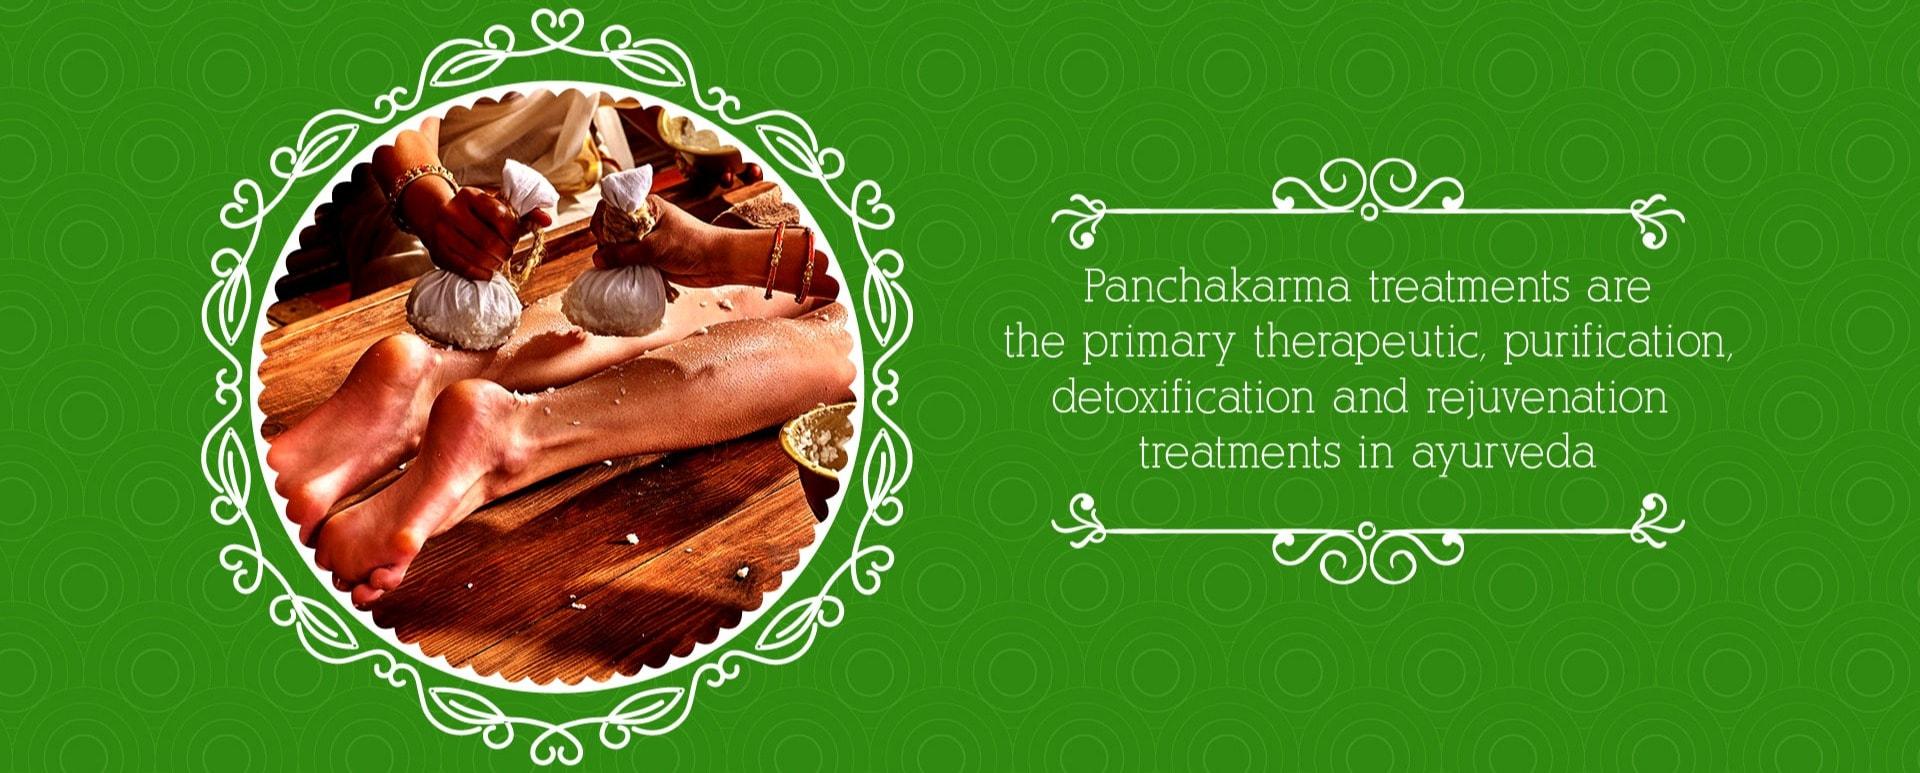 Chirayu Ayurveda and Panchkarma Hospital - Ayurvedic Doctor and Ayurvedic Clinic in Civil Lines, Ajmer